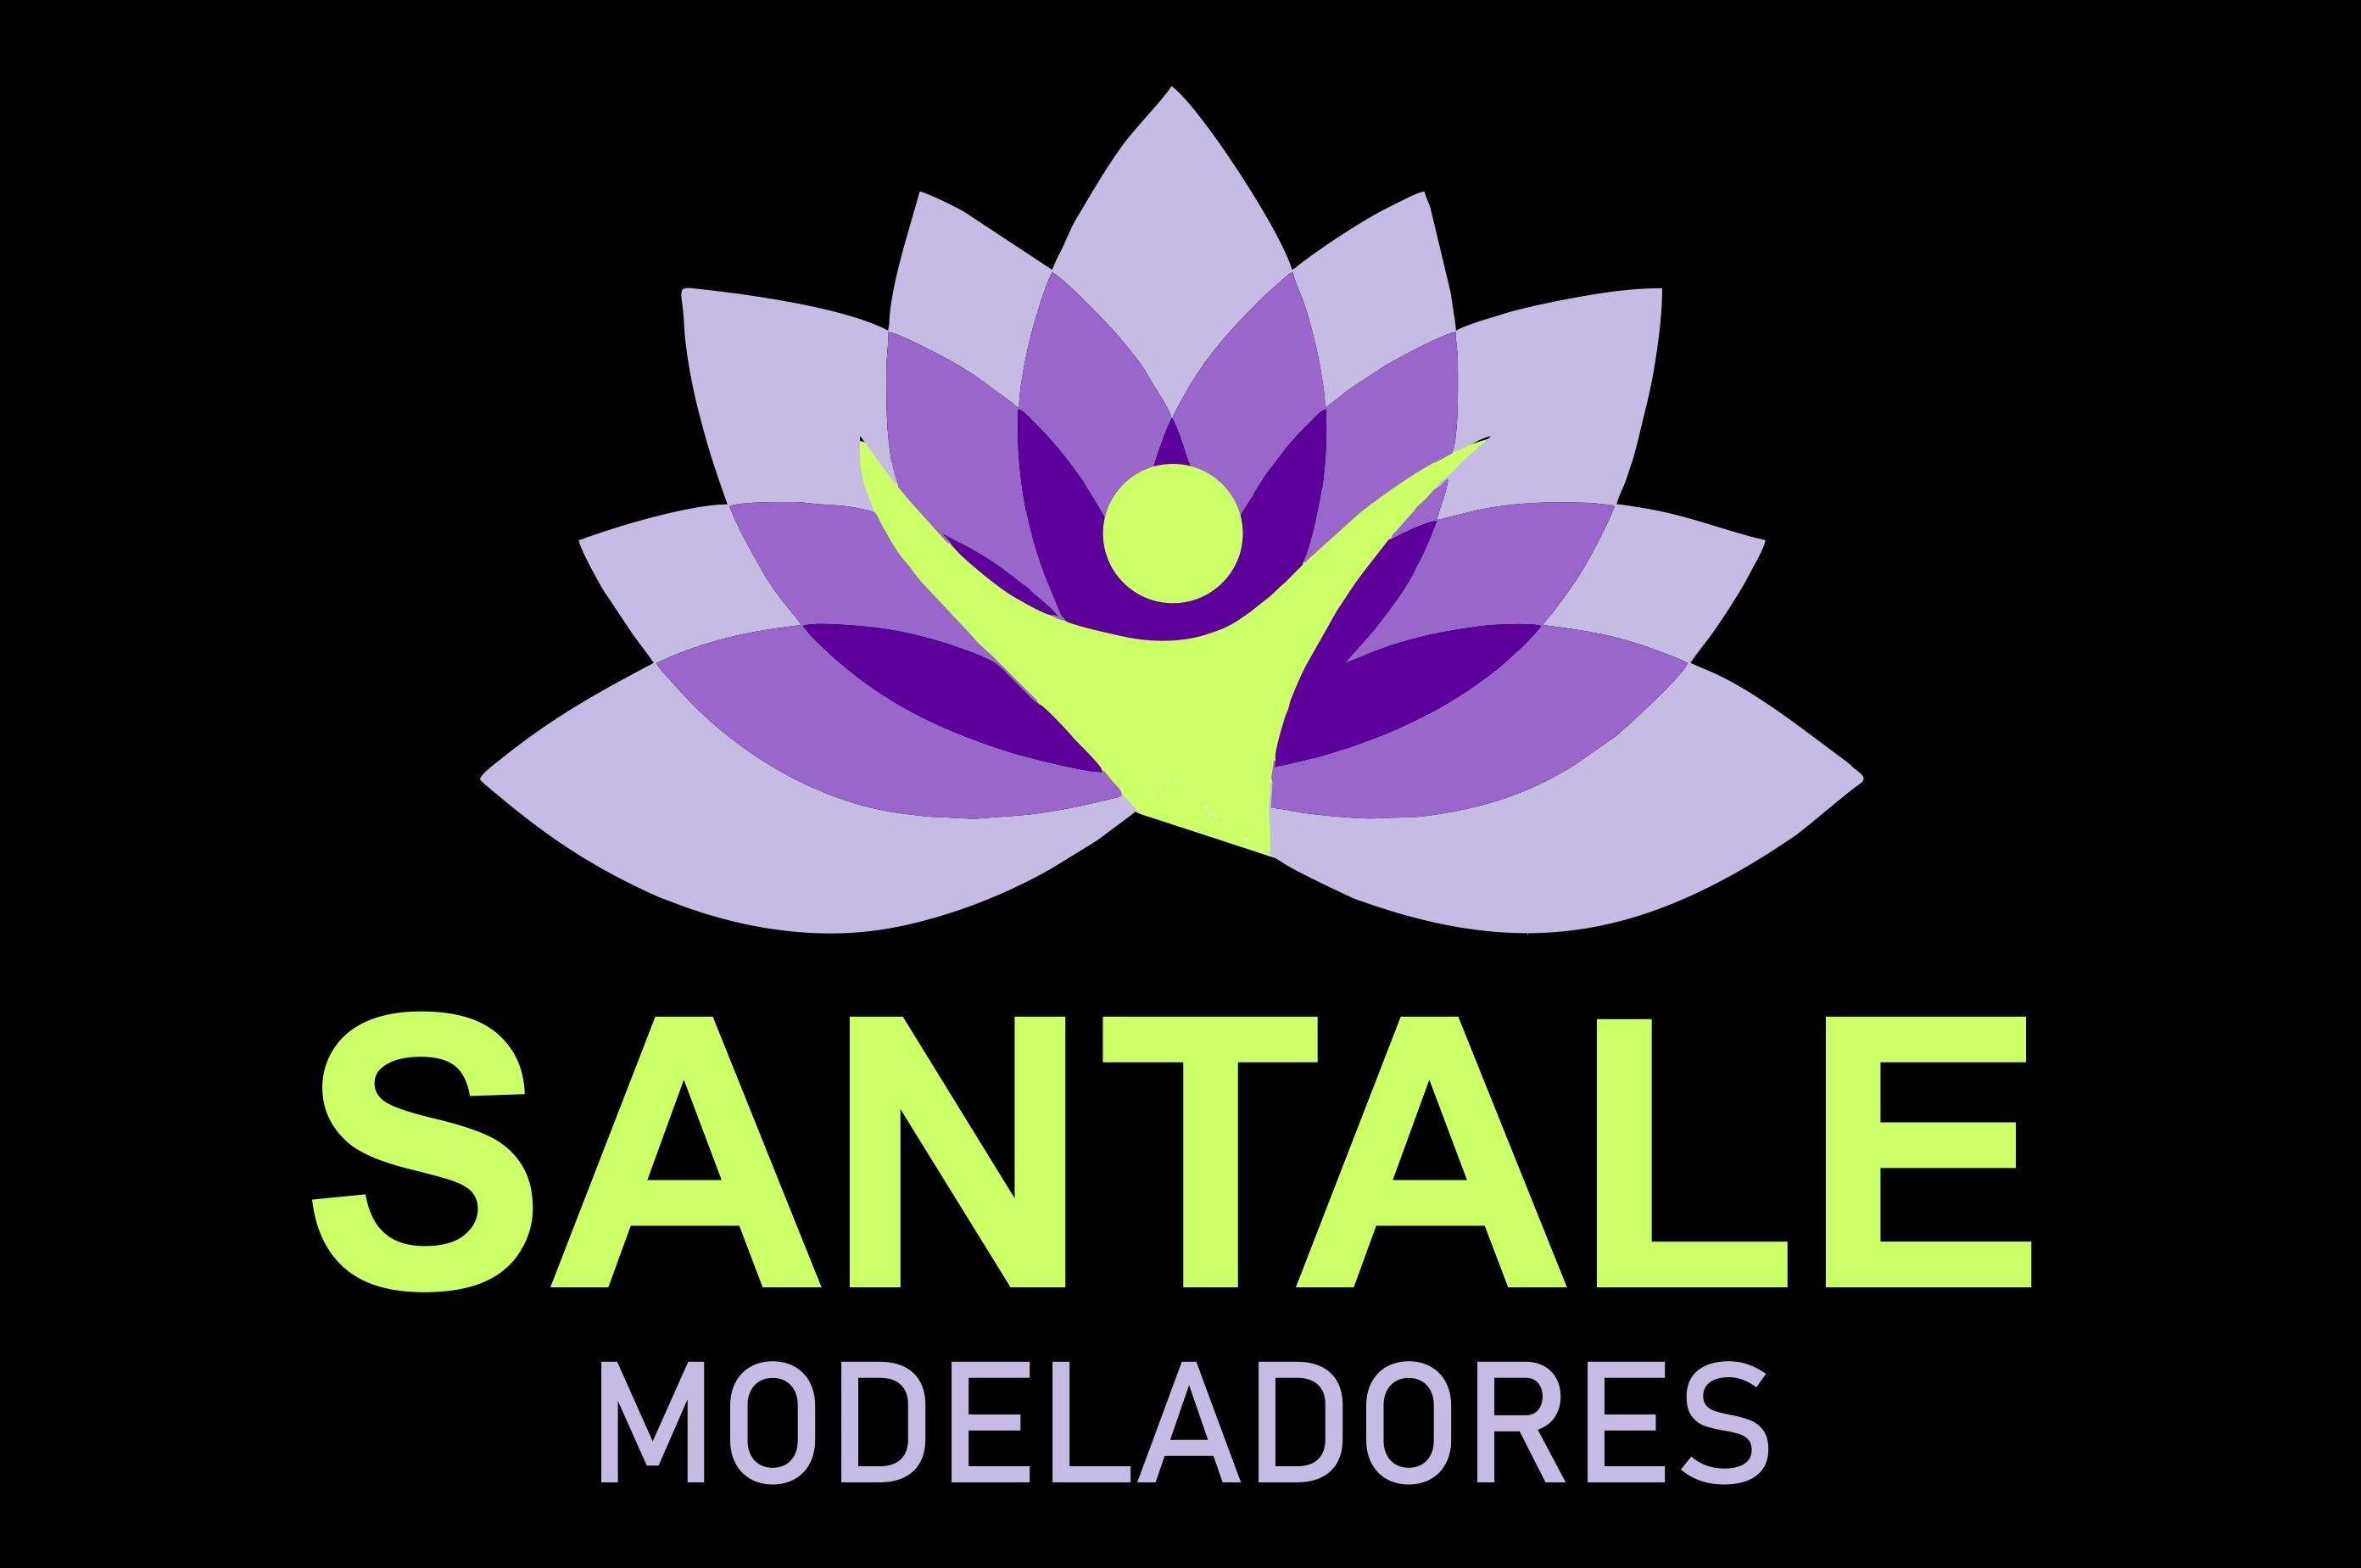 SANTALE MODELADORES